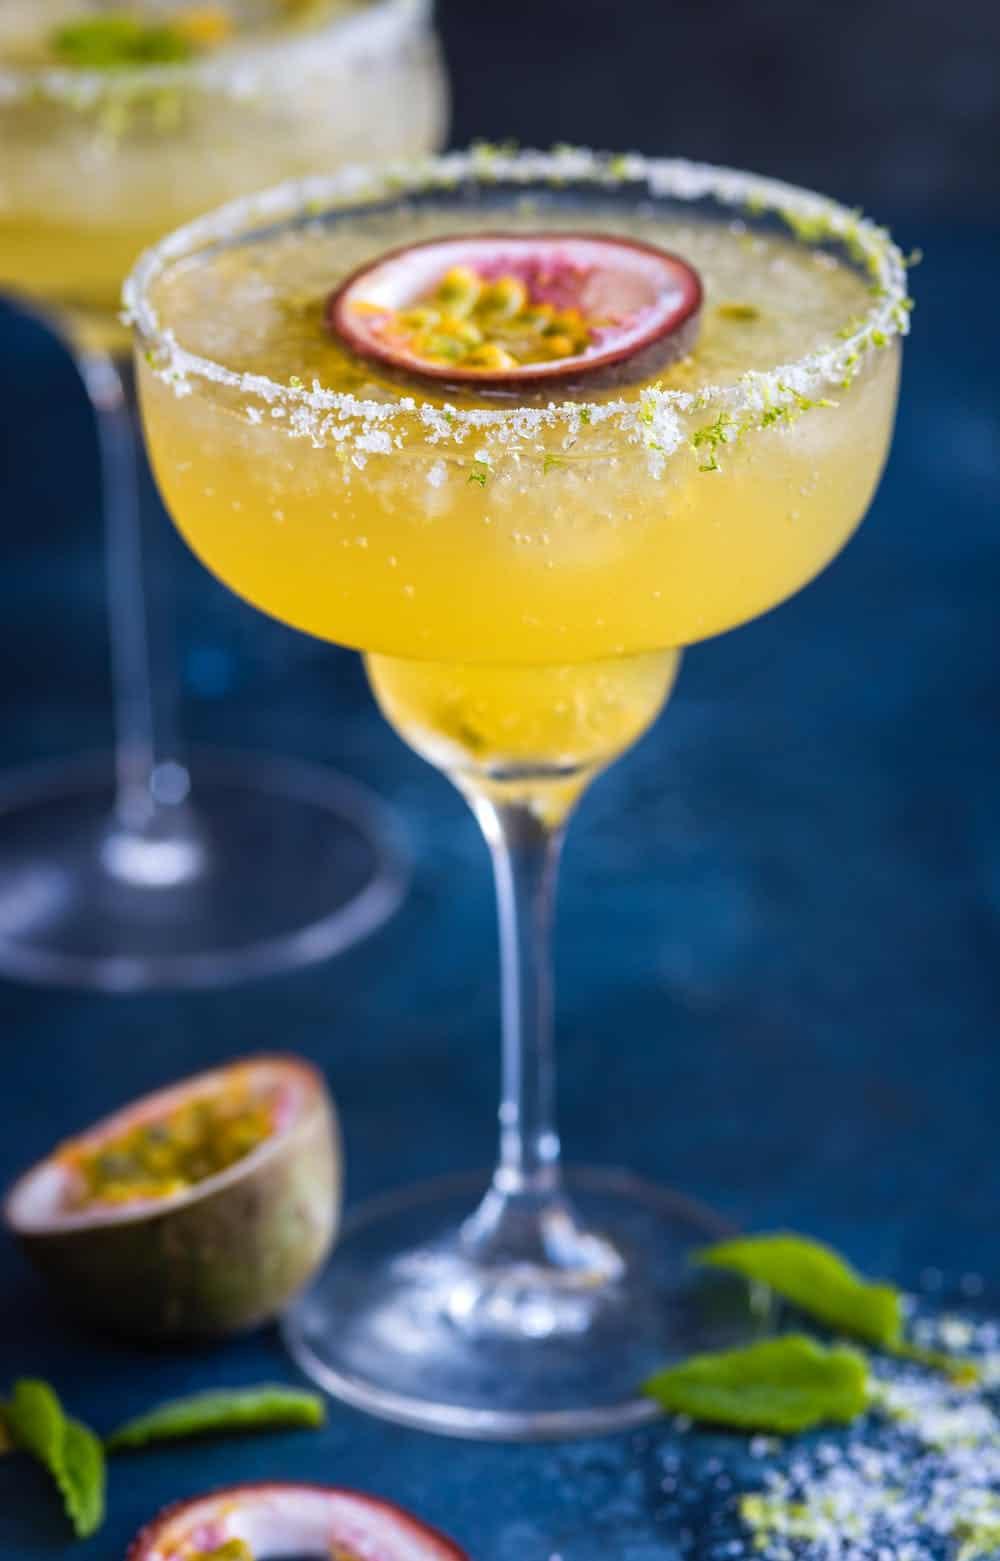 Passionfruit champagne margarita